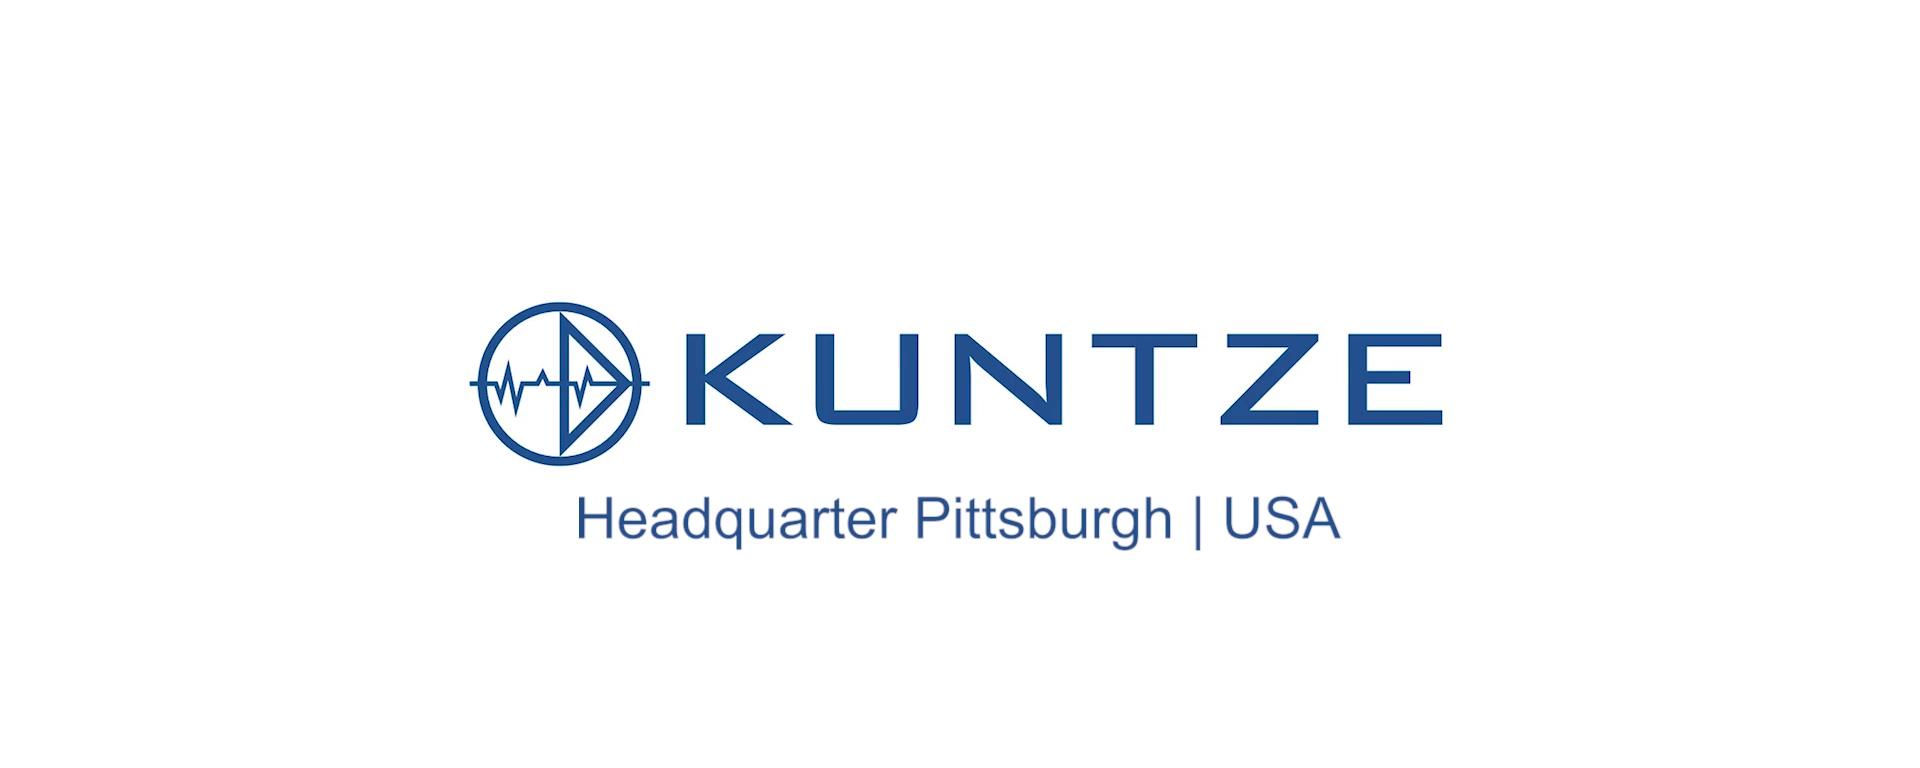 Kuntze_USA_Pittsburgh